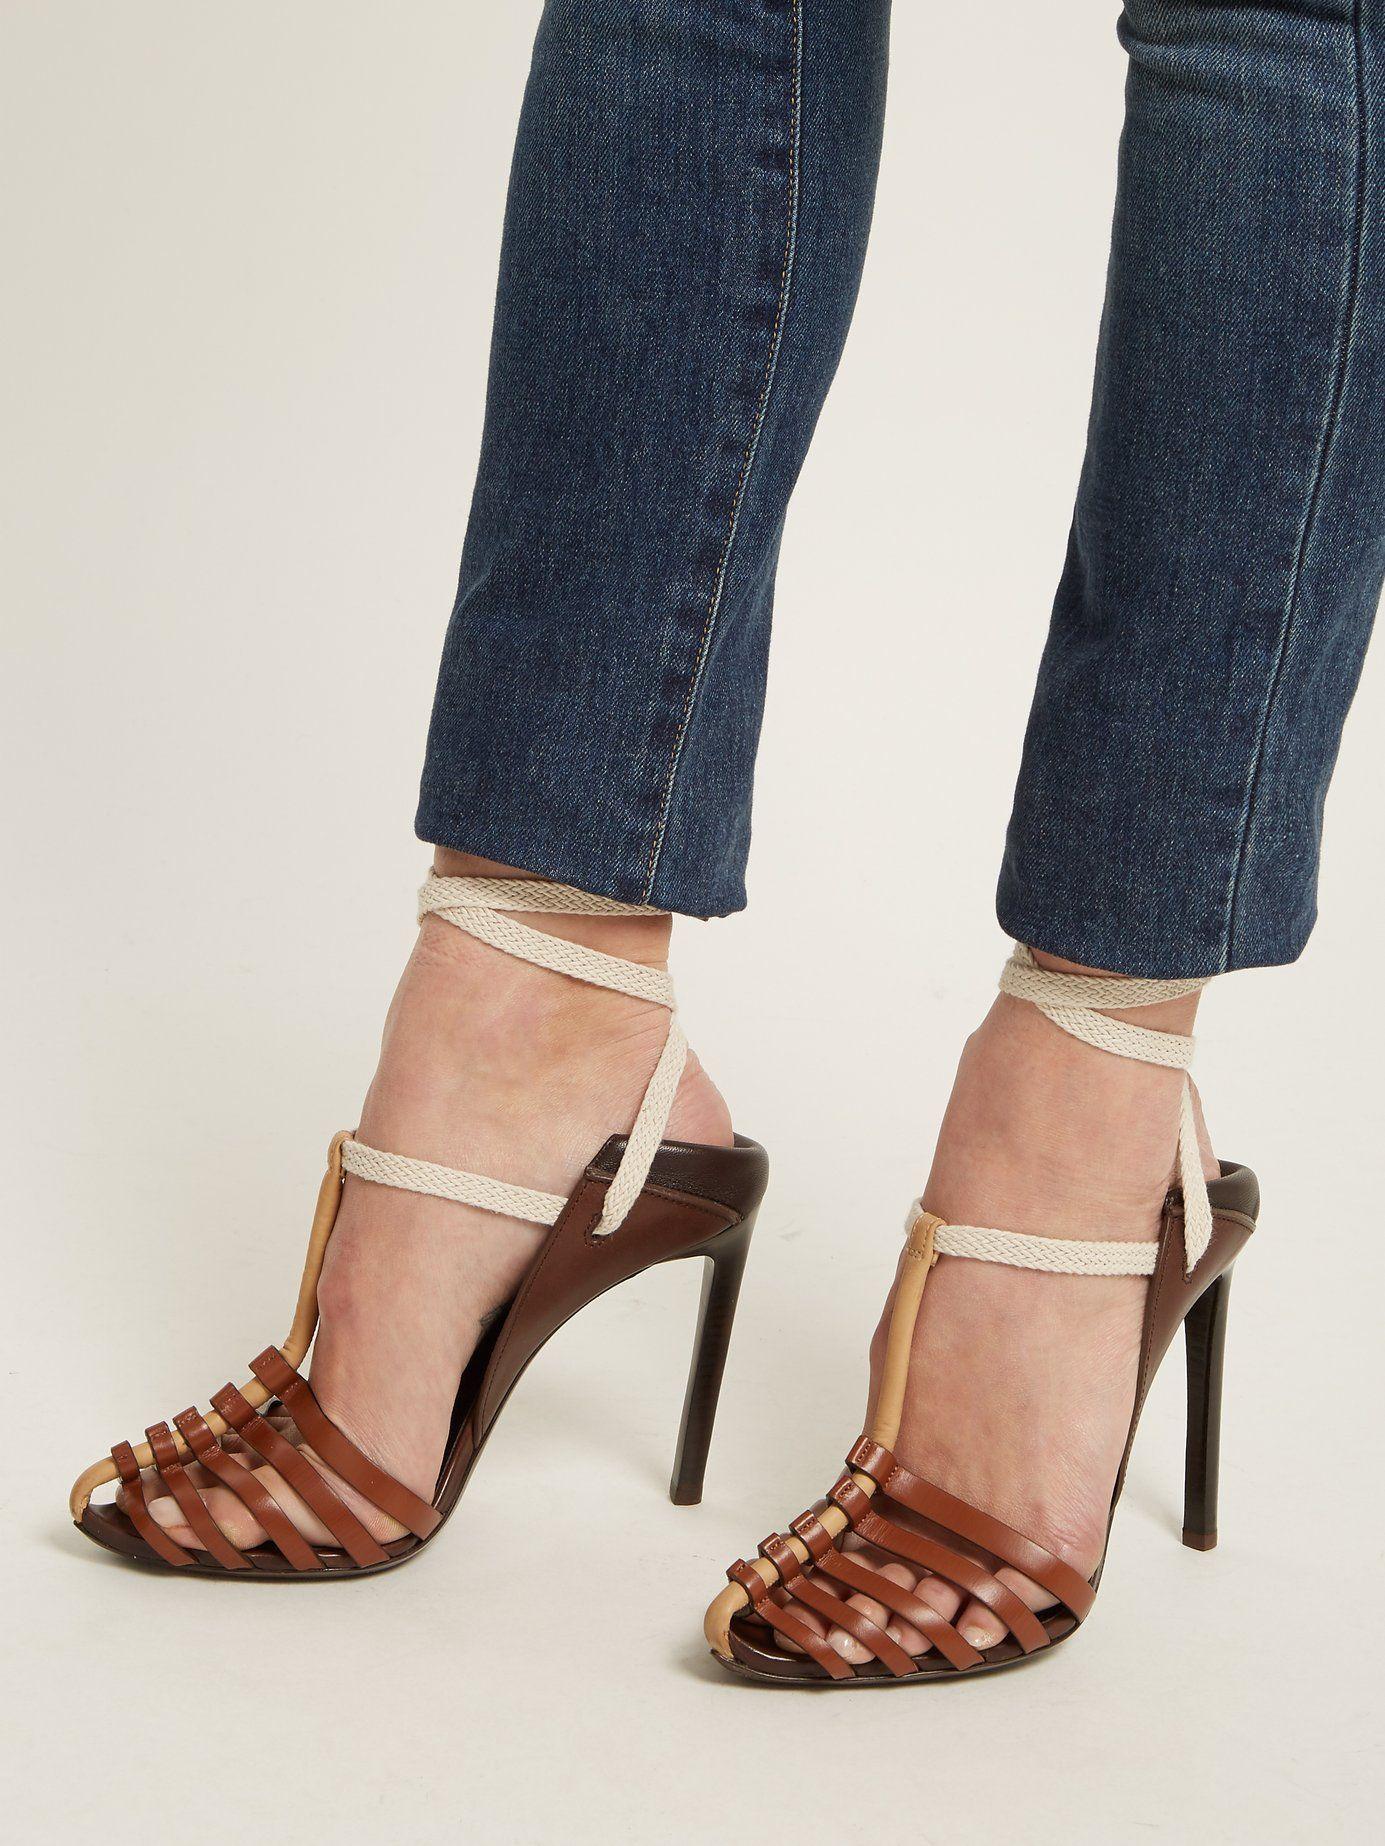 c9835fbb770 Click here to buy Saint Laurent Majorelle   Mansour leather sandals at  MATCHESFASHION.COM